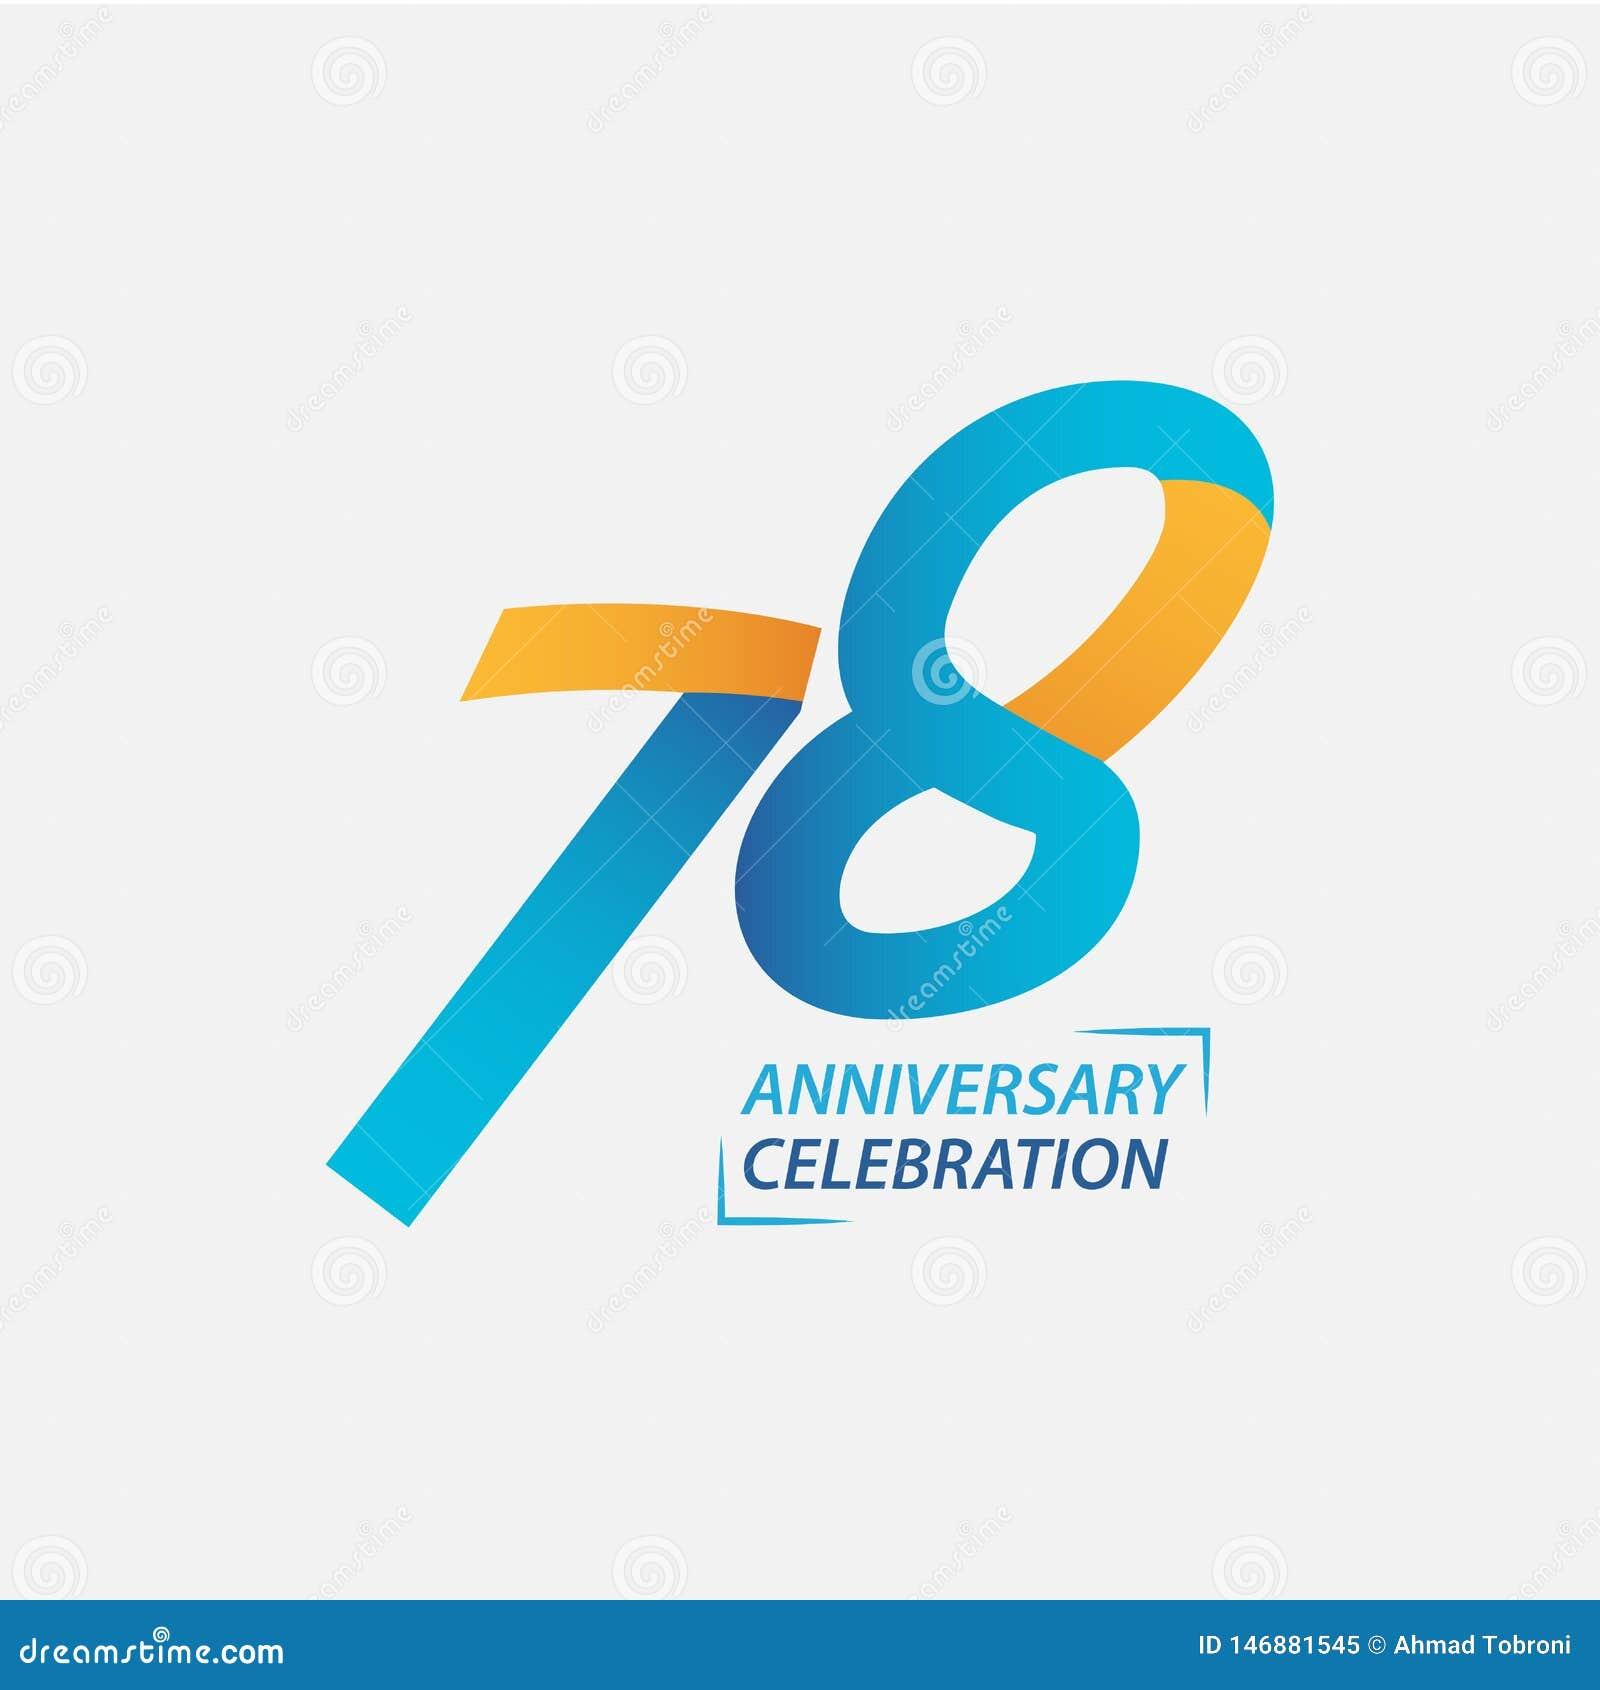 78 Year Anniversary Celebration Vector Template Design Illustration